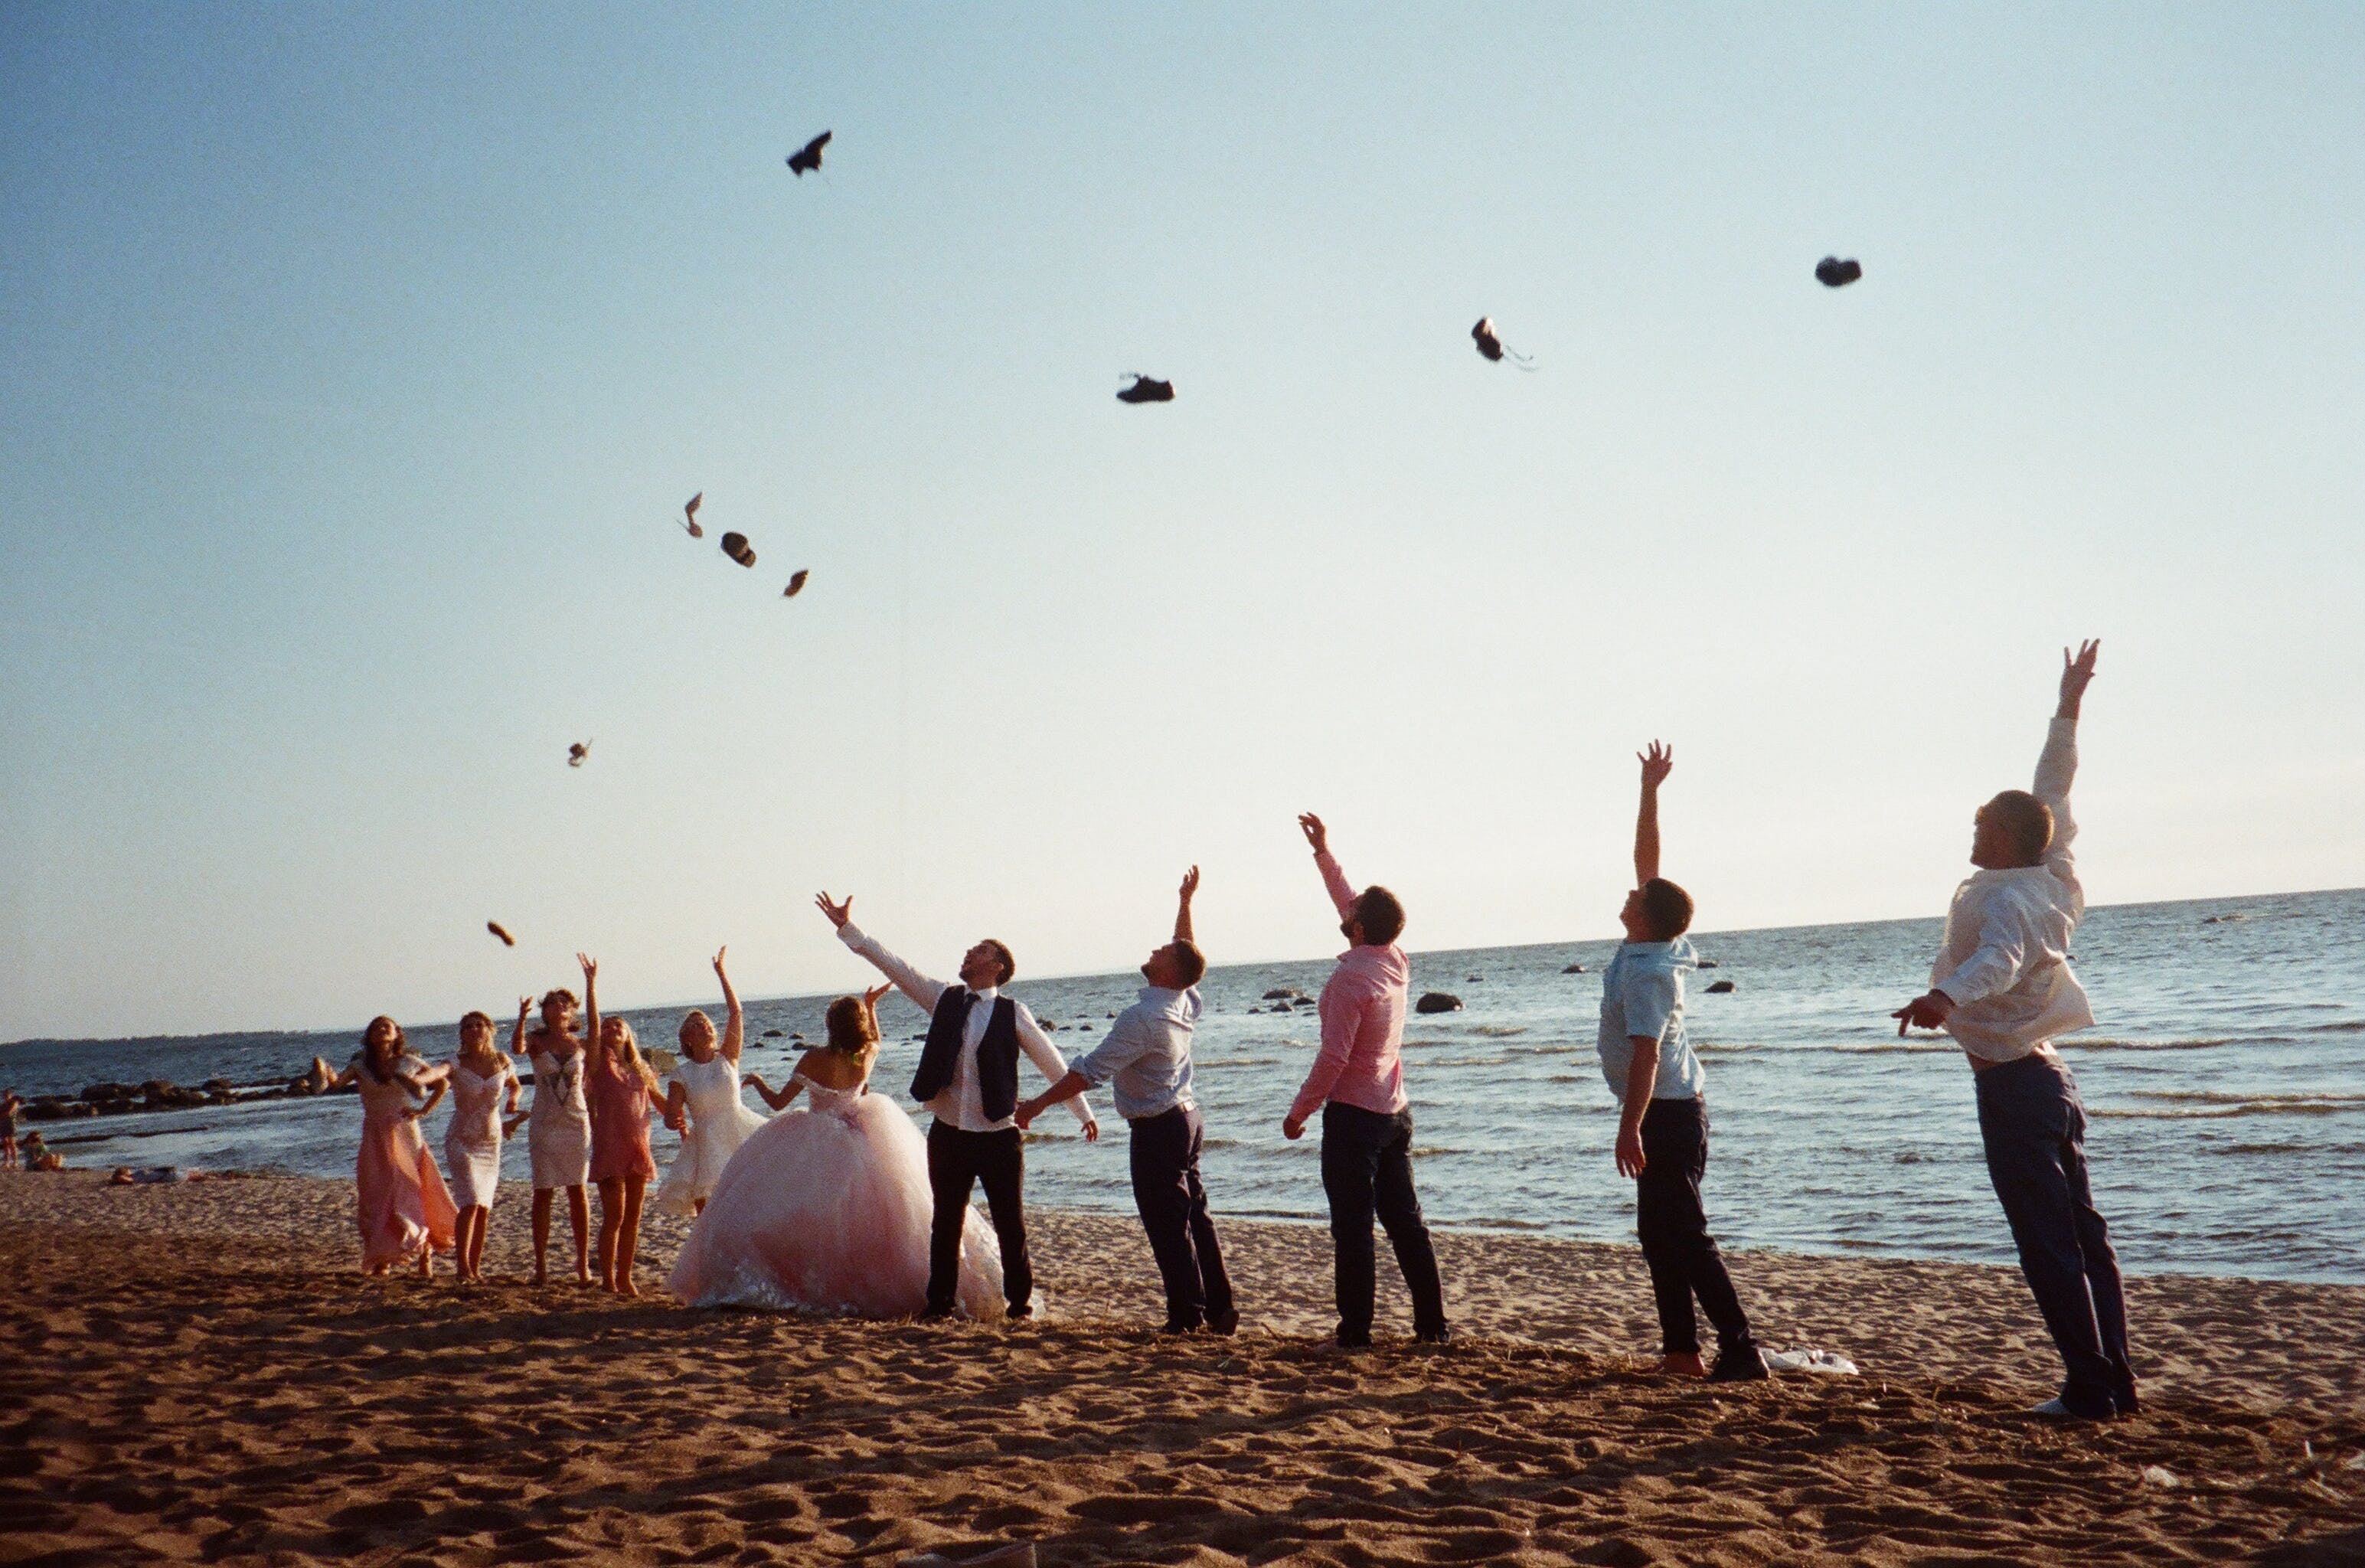 People Throwing Things Near the Seashore